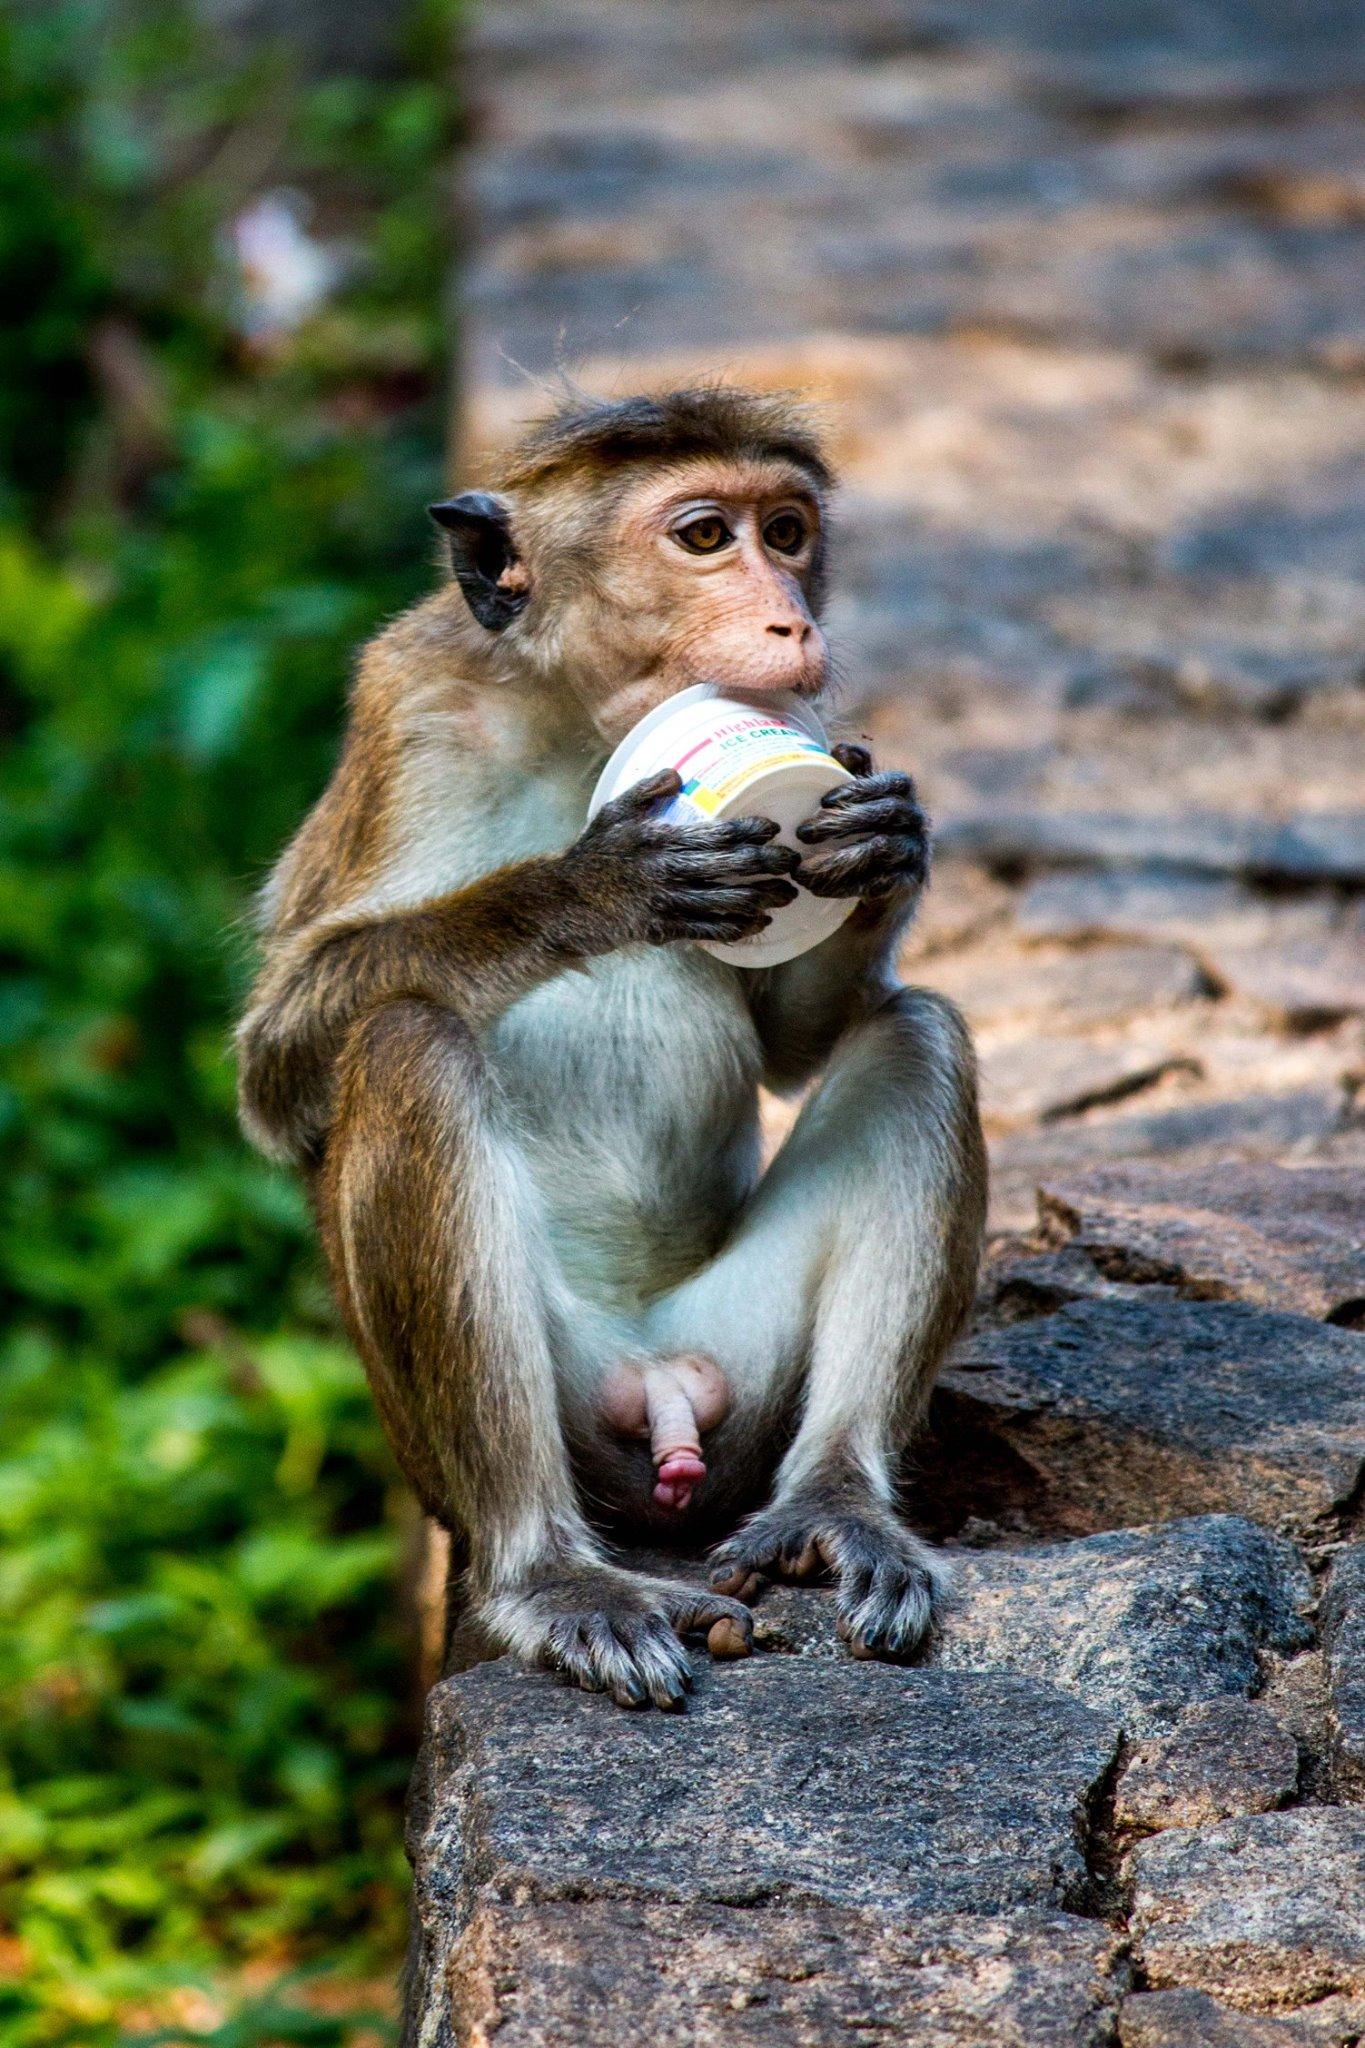 invite-to-paradise-sri-lanka-and-maldives-specialists-travel-agent-tour-operator-customer-review--feedback-joel-rhian-monkey-5.jpg